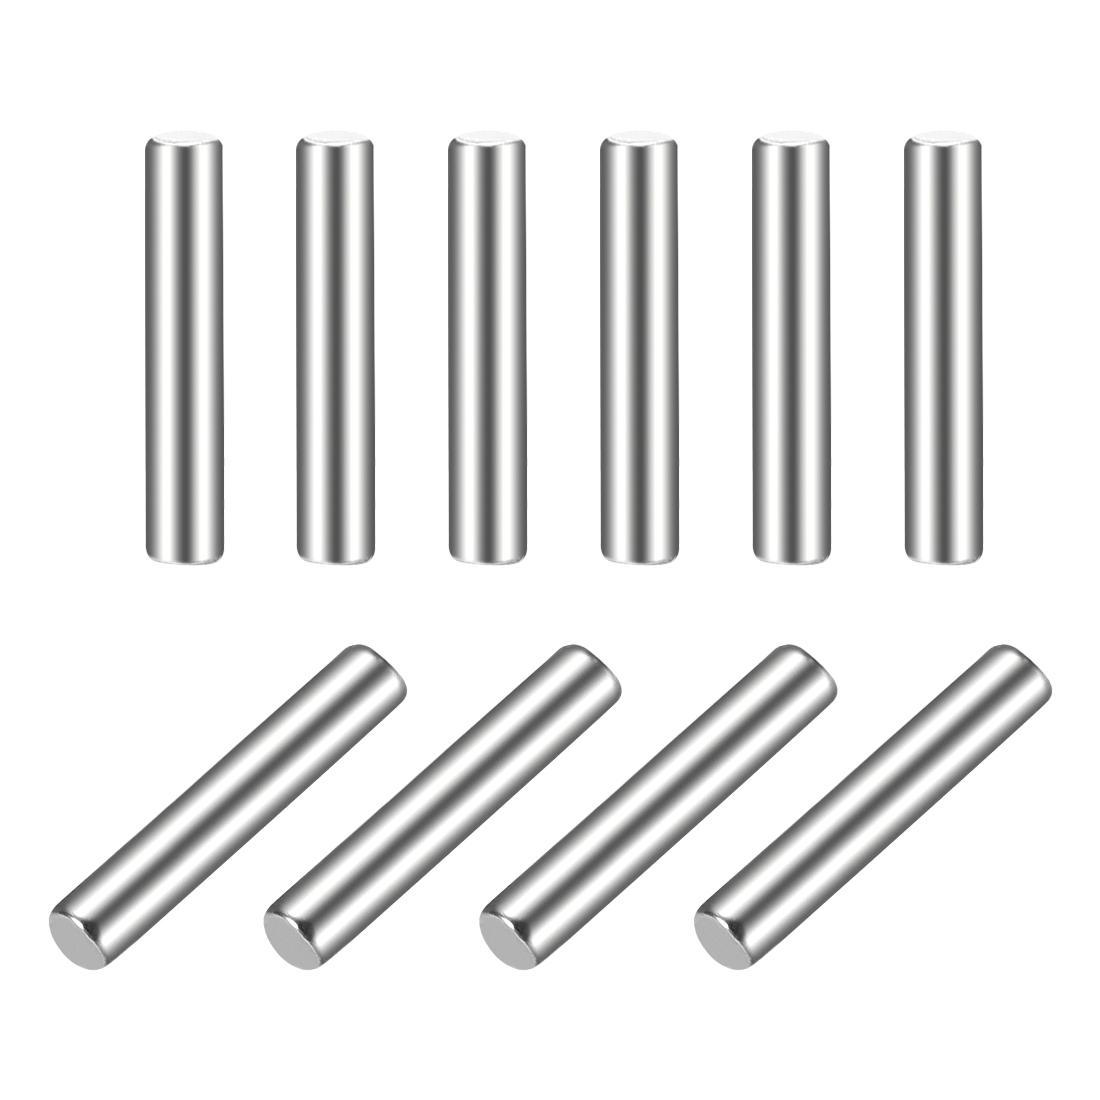 10Pcs 2mm x 12mm Dowel Pin 304 Stainless Steel Shelf Support Pin Fasten